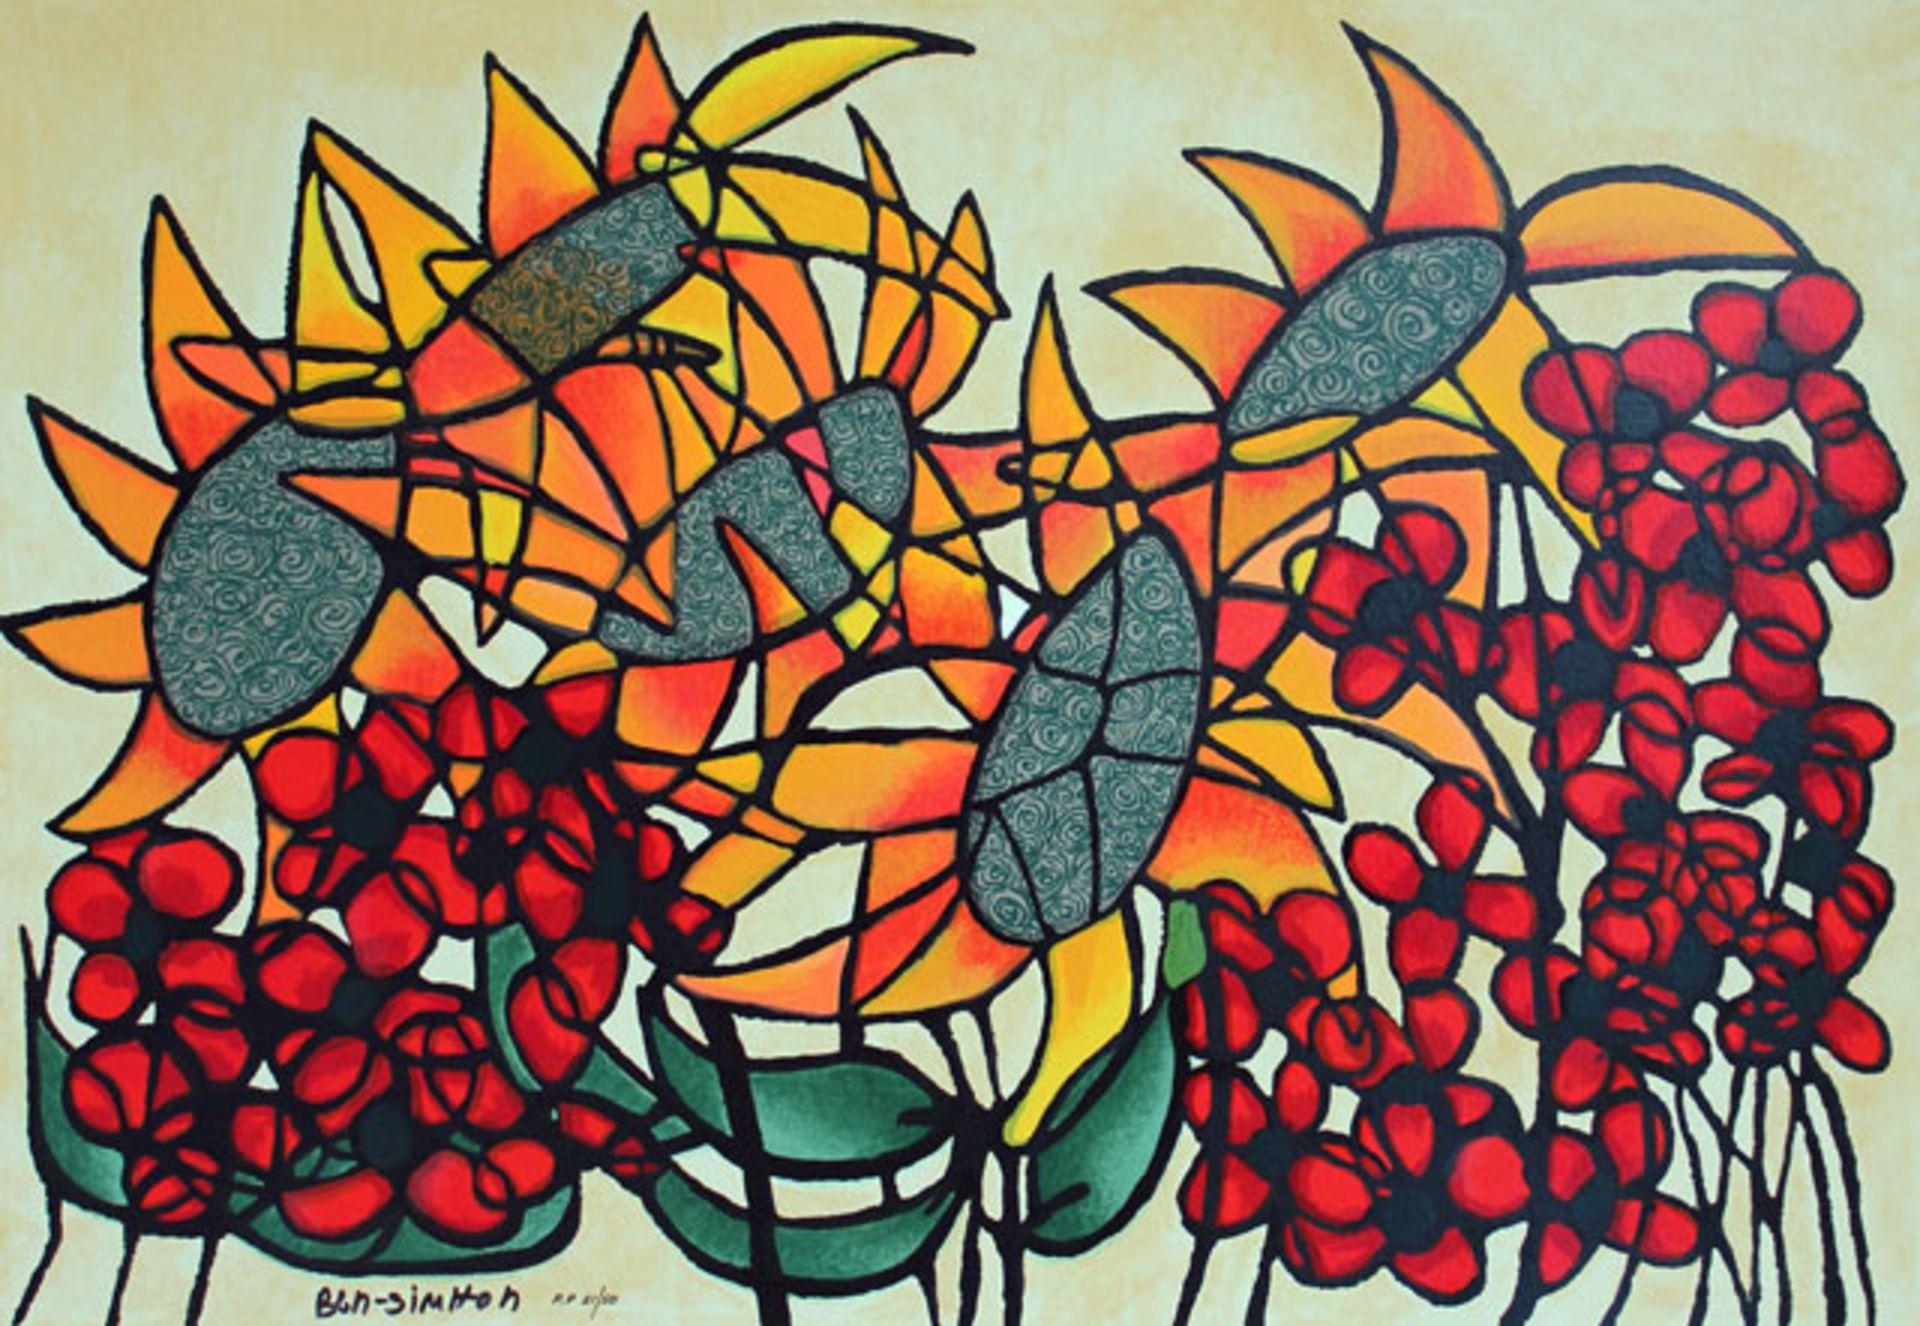 Avi Ben-Simhon Sunflowers - Image 2 of 3